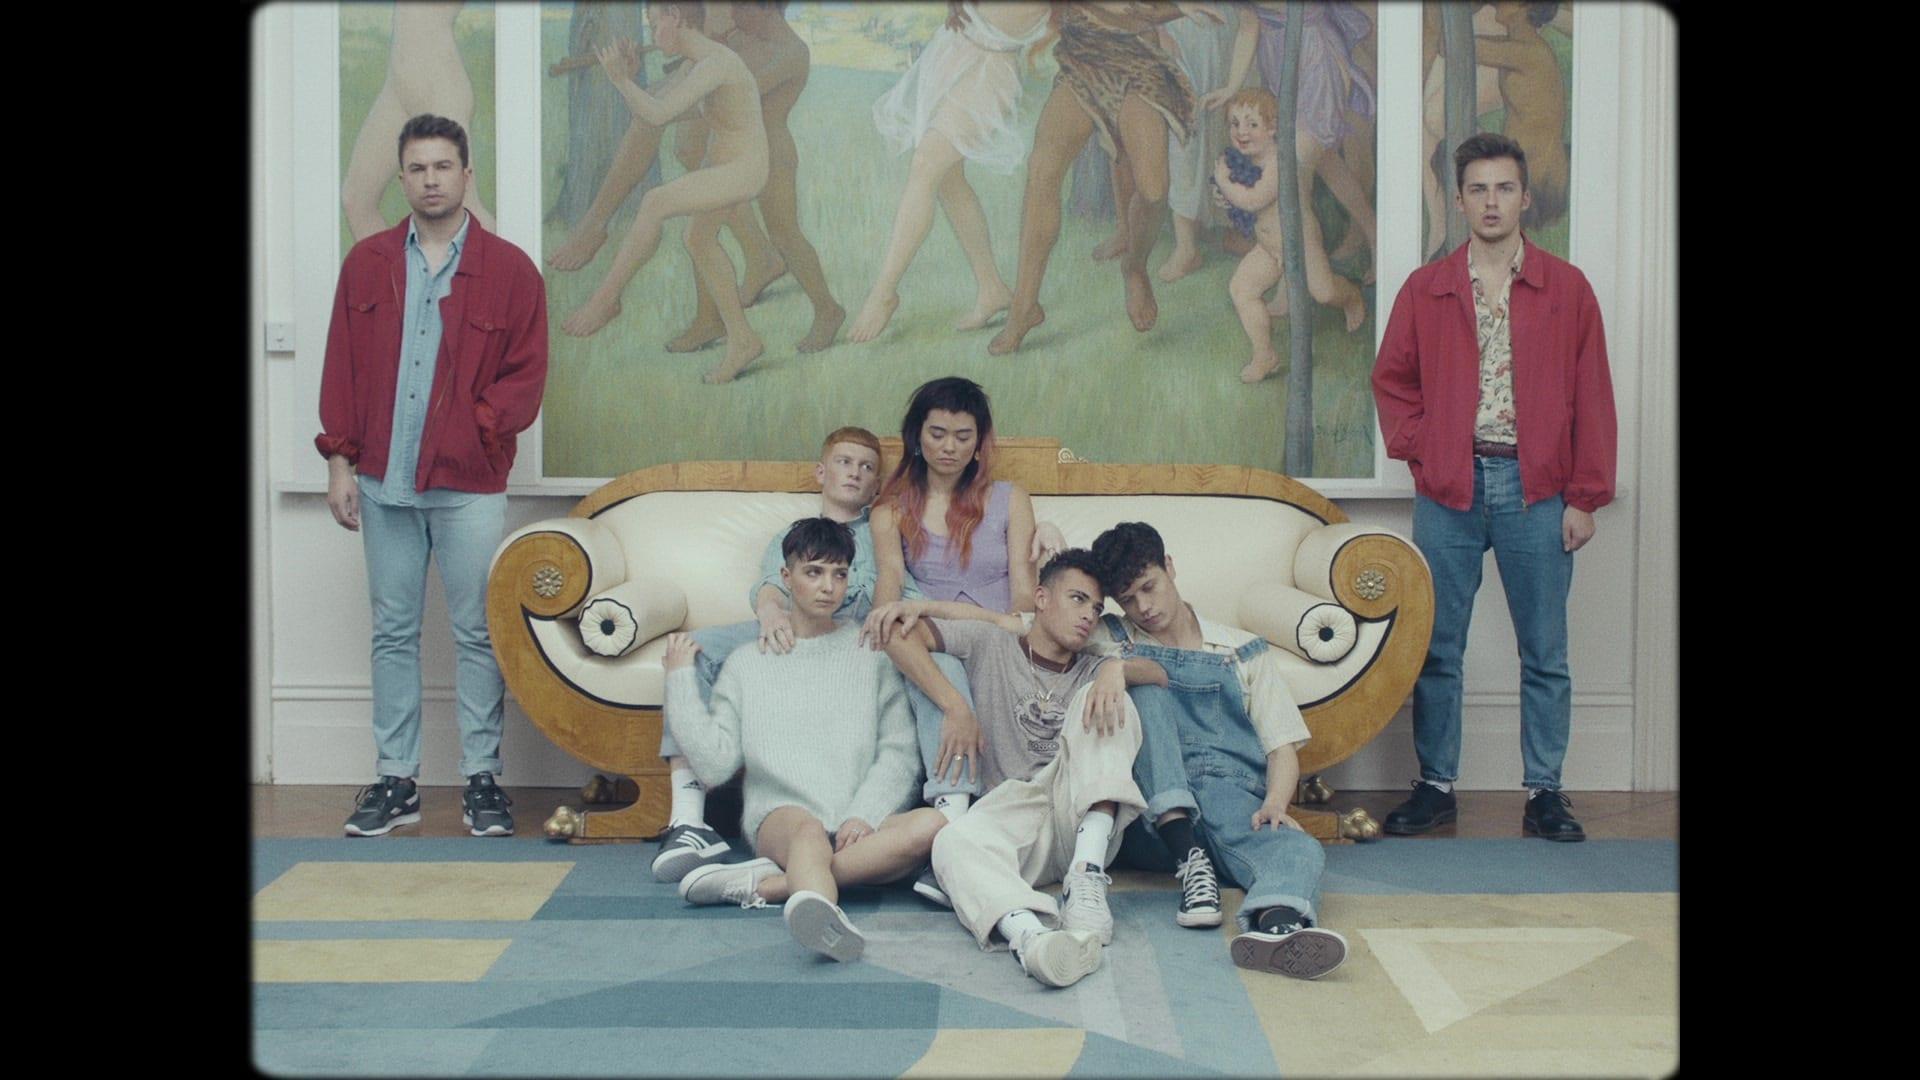 APRE Unveil Video For Latest Single Backstreet